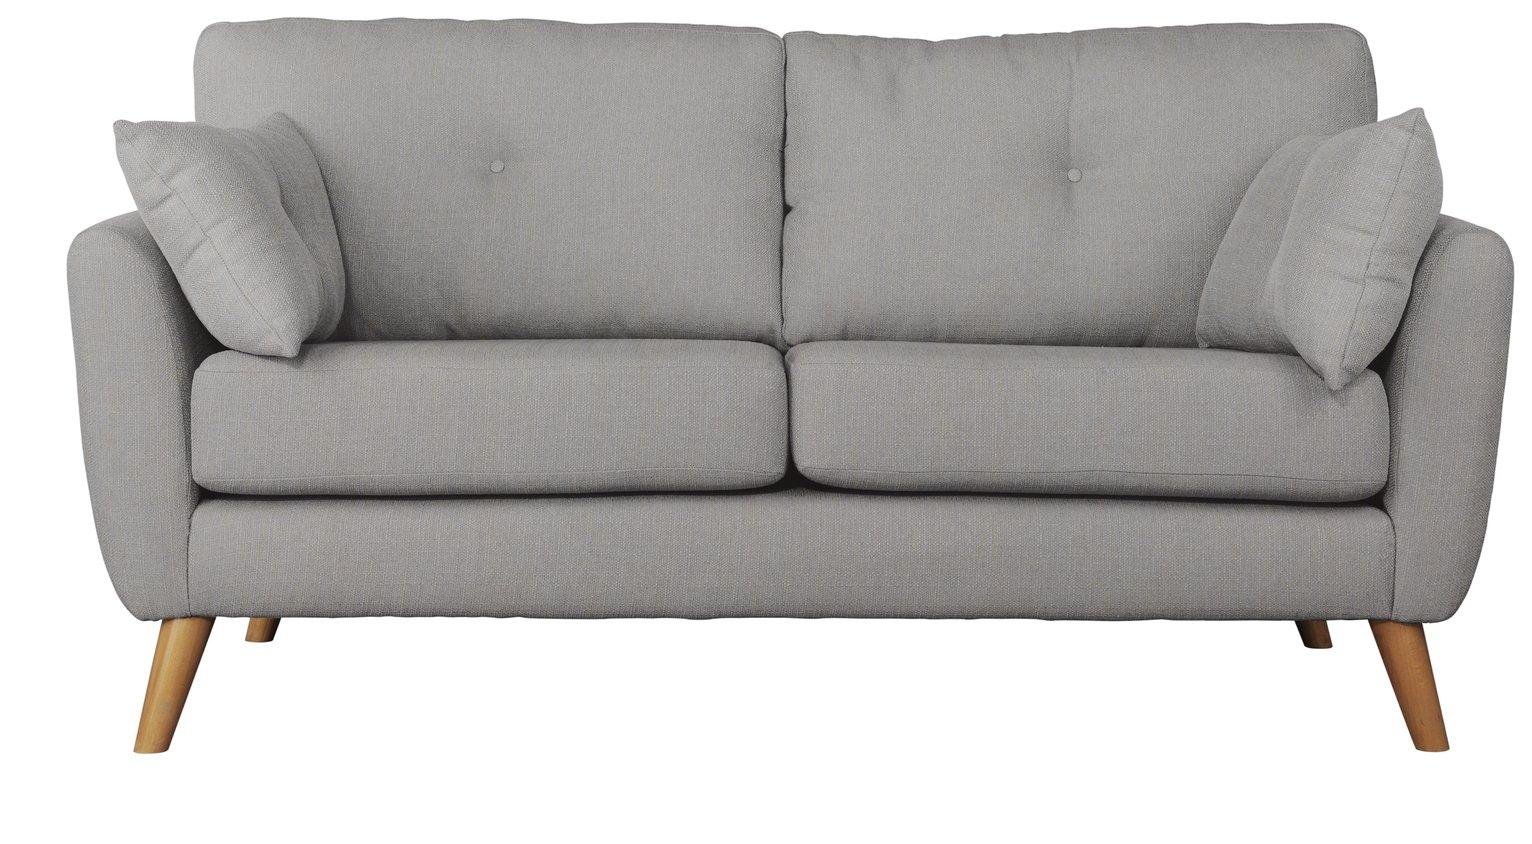 Argos Home Kari 3 Seater Fabric Sofa   Light Grey